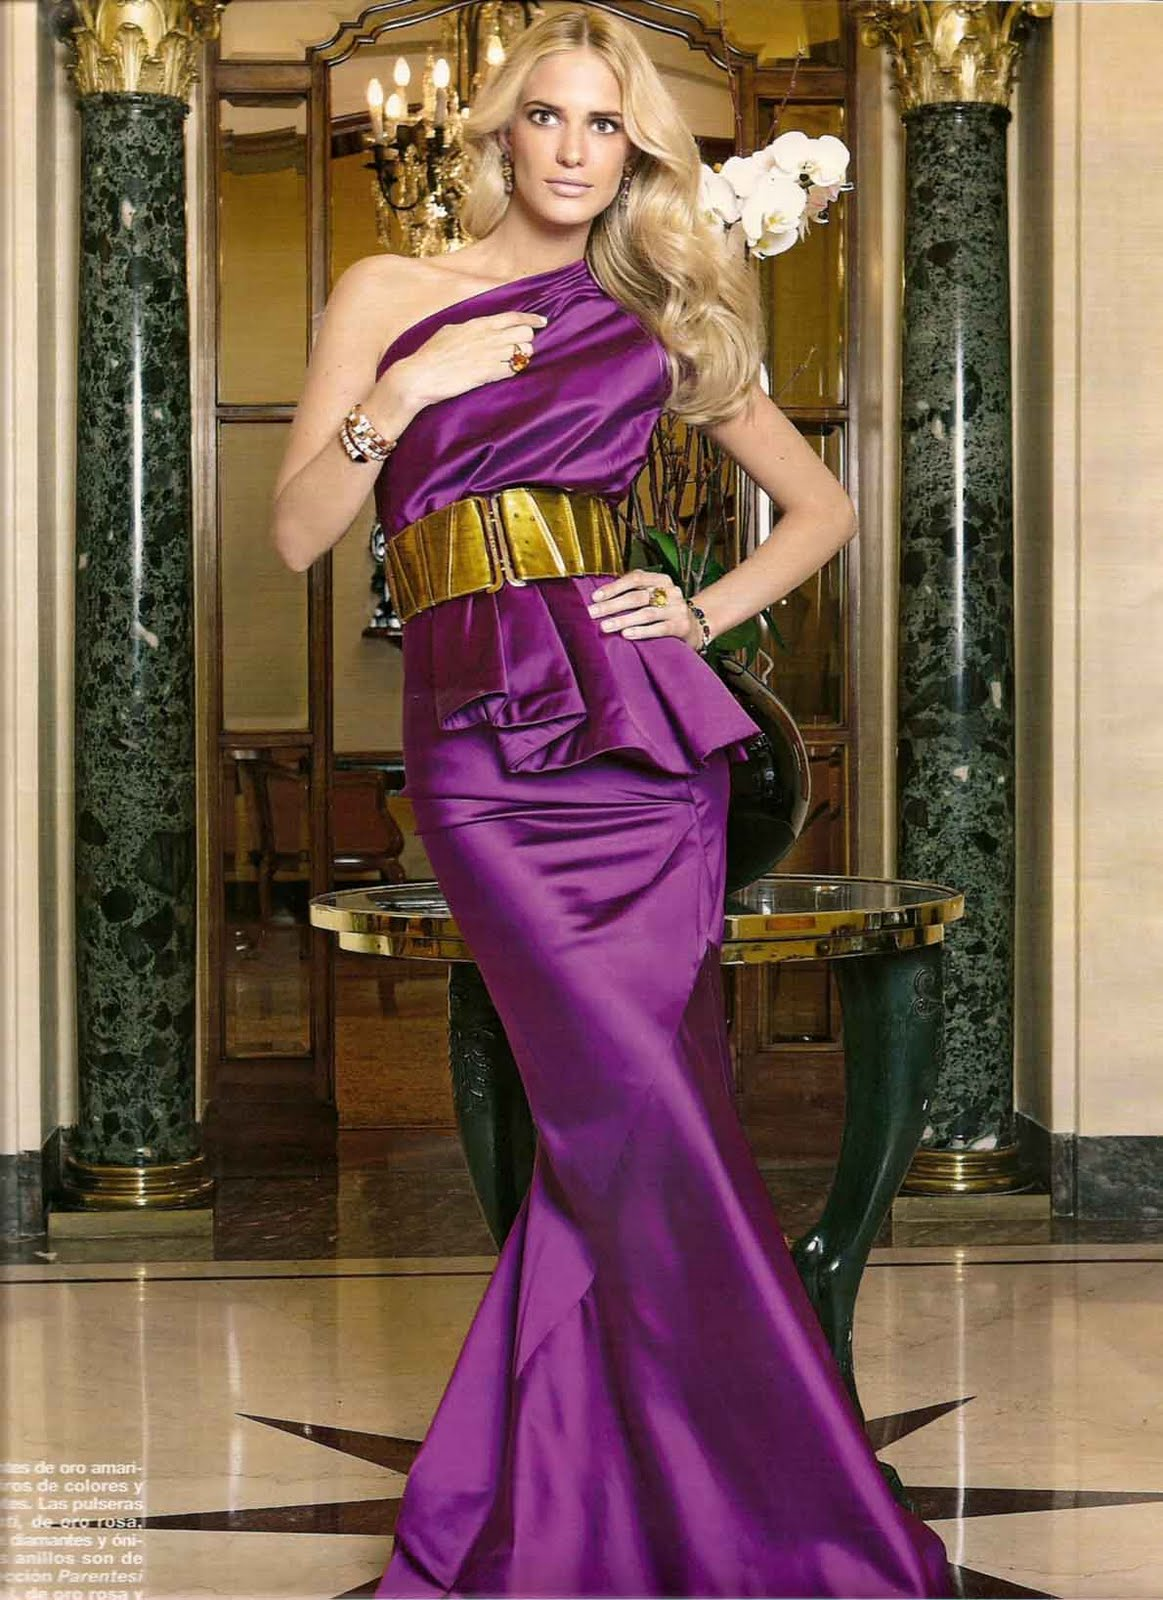 cc89f545a1608 طلبــات الفساتيــن Fashion Requests  الارشيف  - منتديات شبكة الإقلاع ®